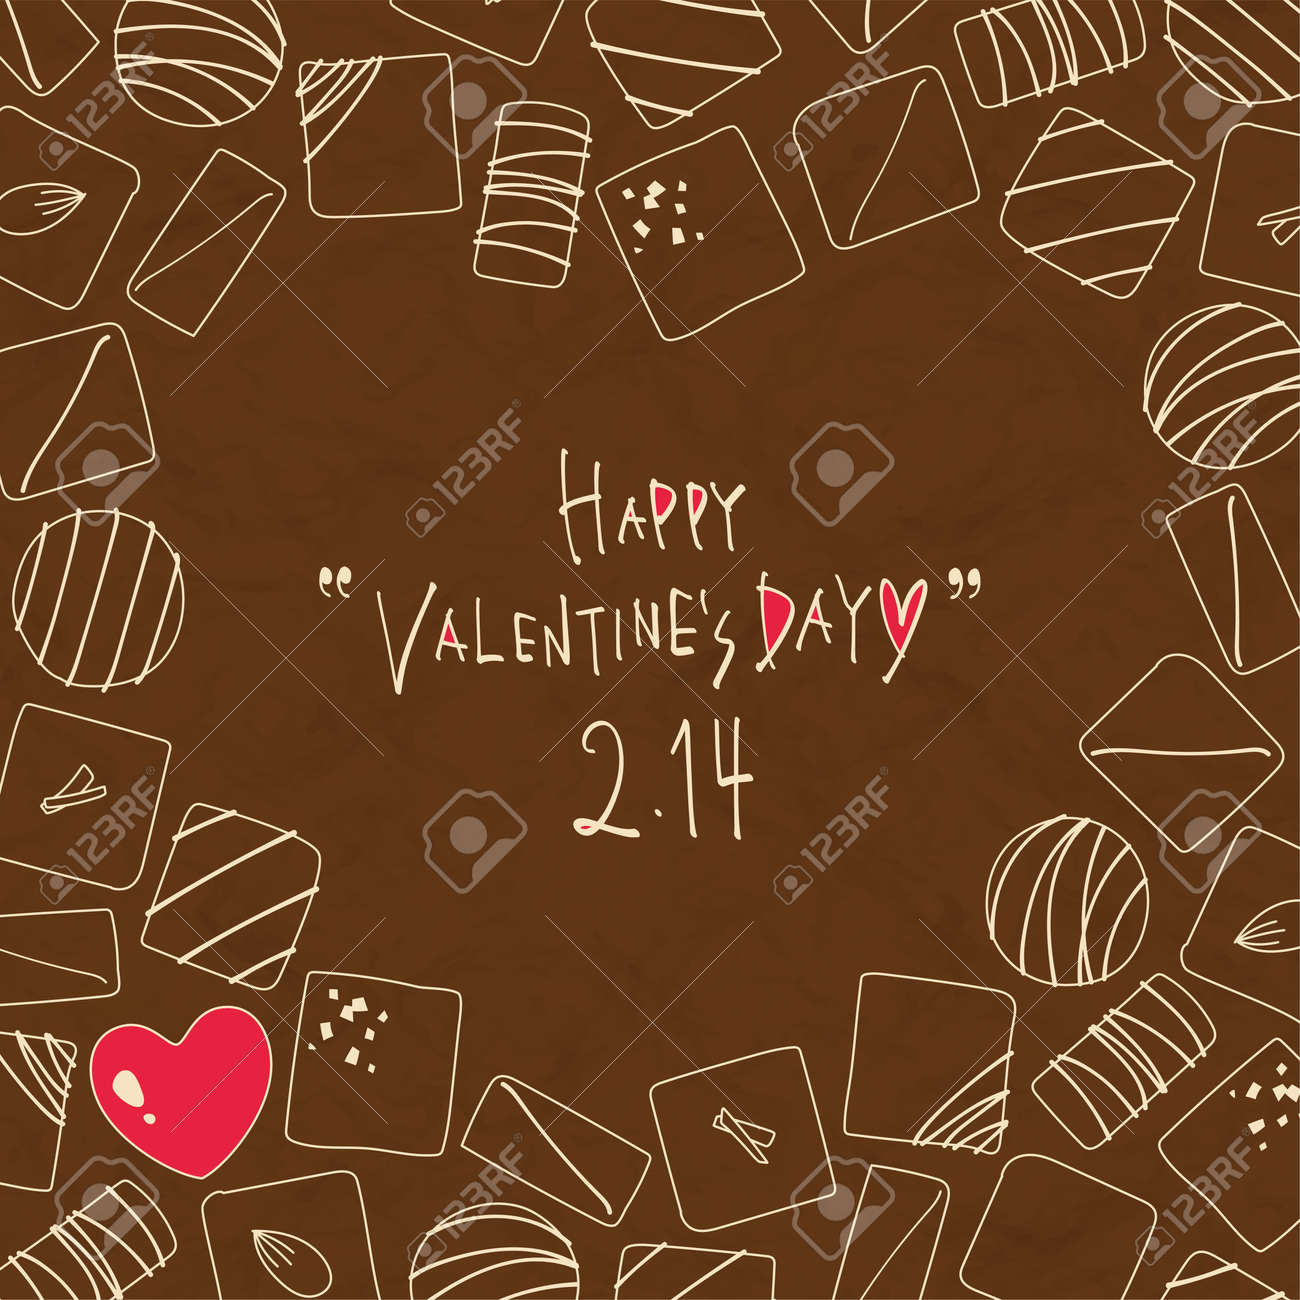 Hand-painted bonbon chocolate bird's-eye view illustration background - 160250714